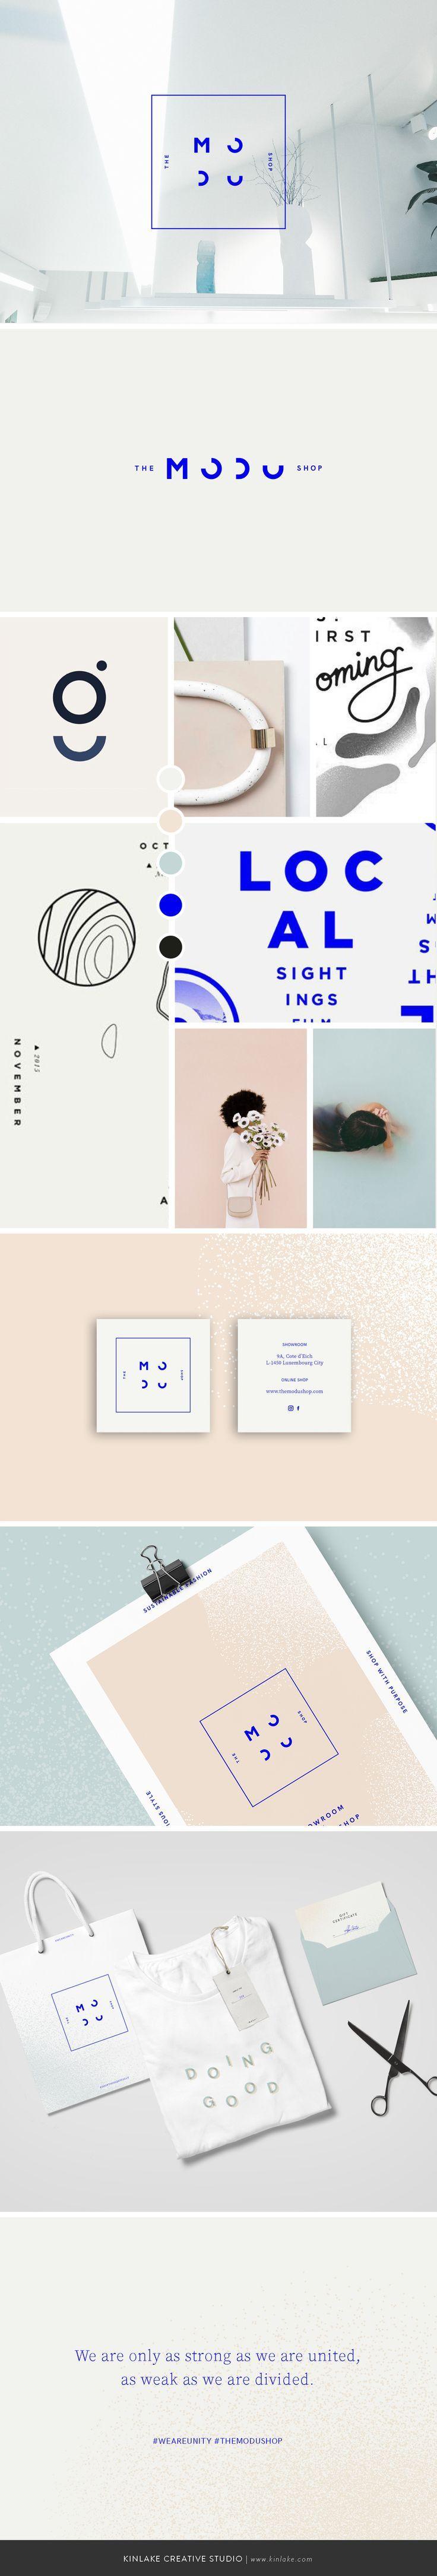 The Modu Shop | Brand Design by Kinlake www.kinlake.com